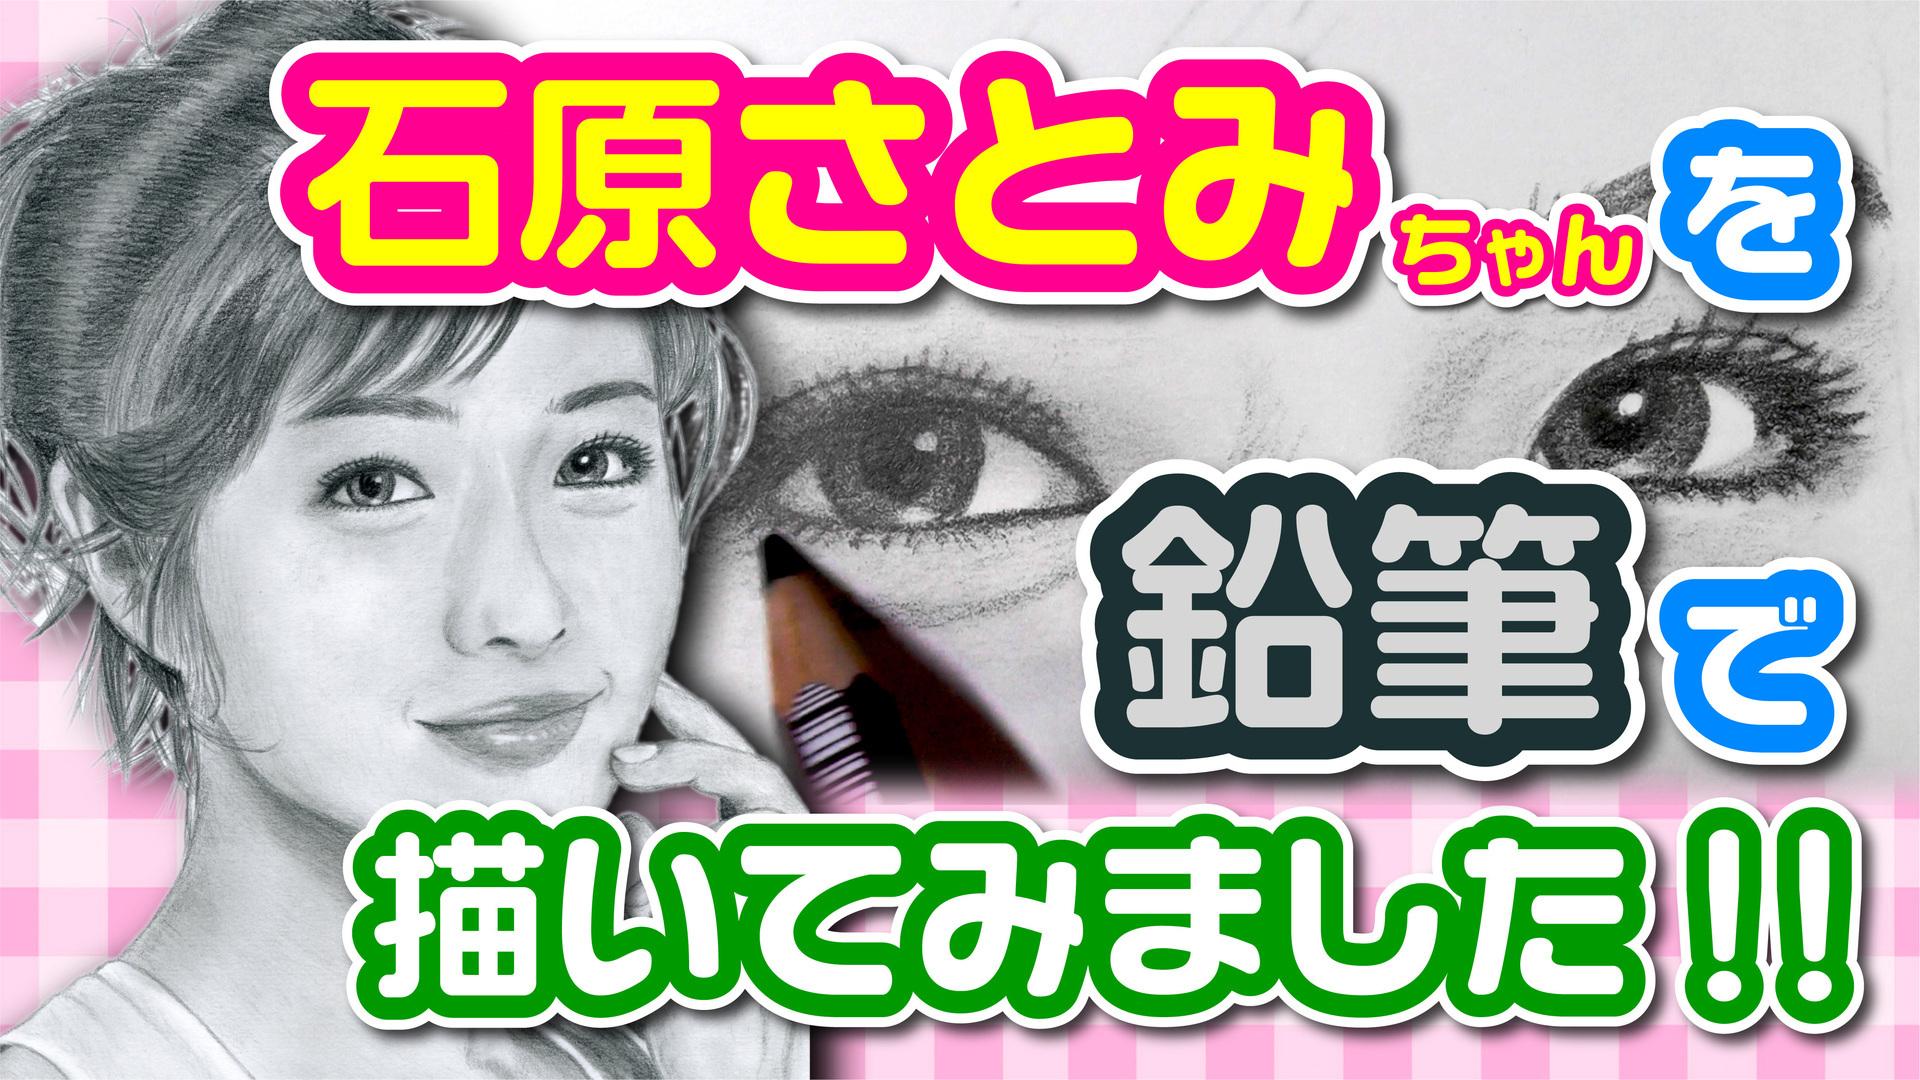 Youtubeサムネイル 石原さとみ鉛筆画.jpg